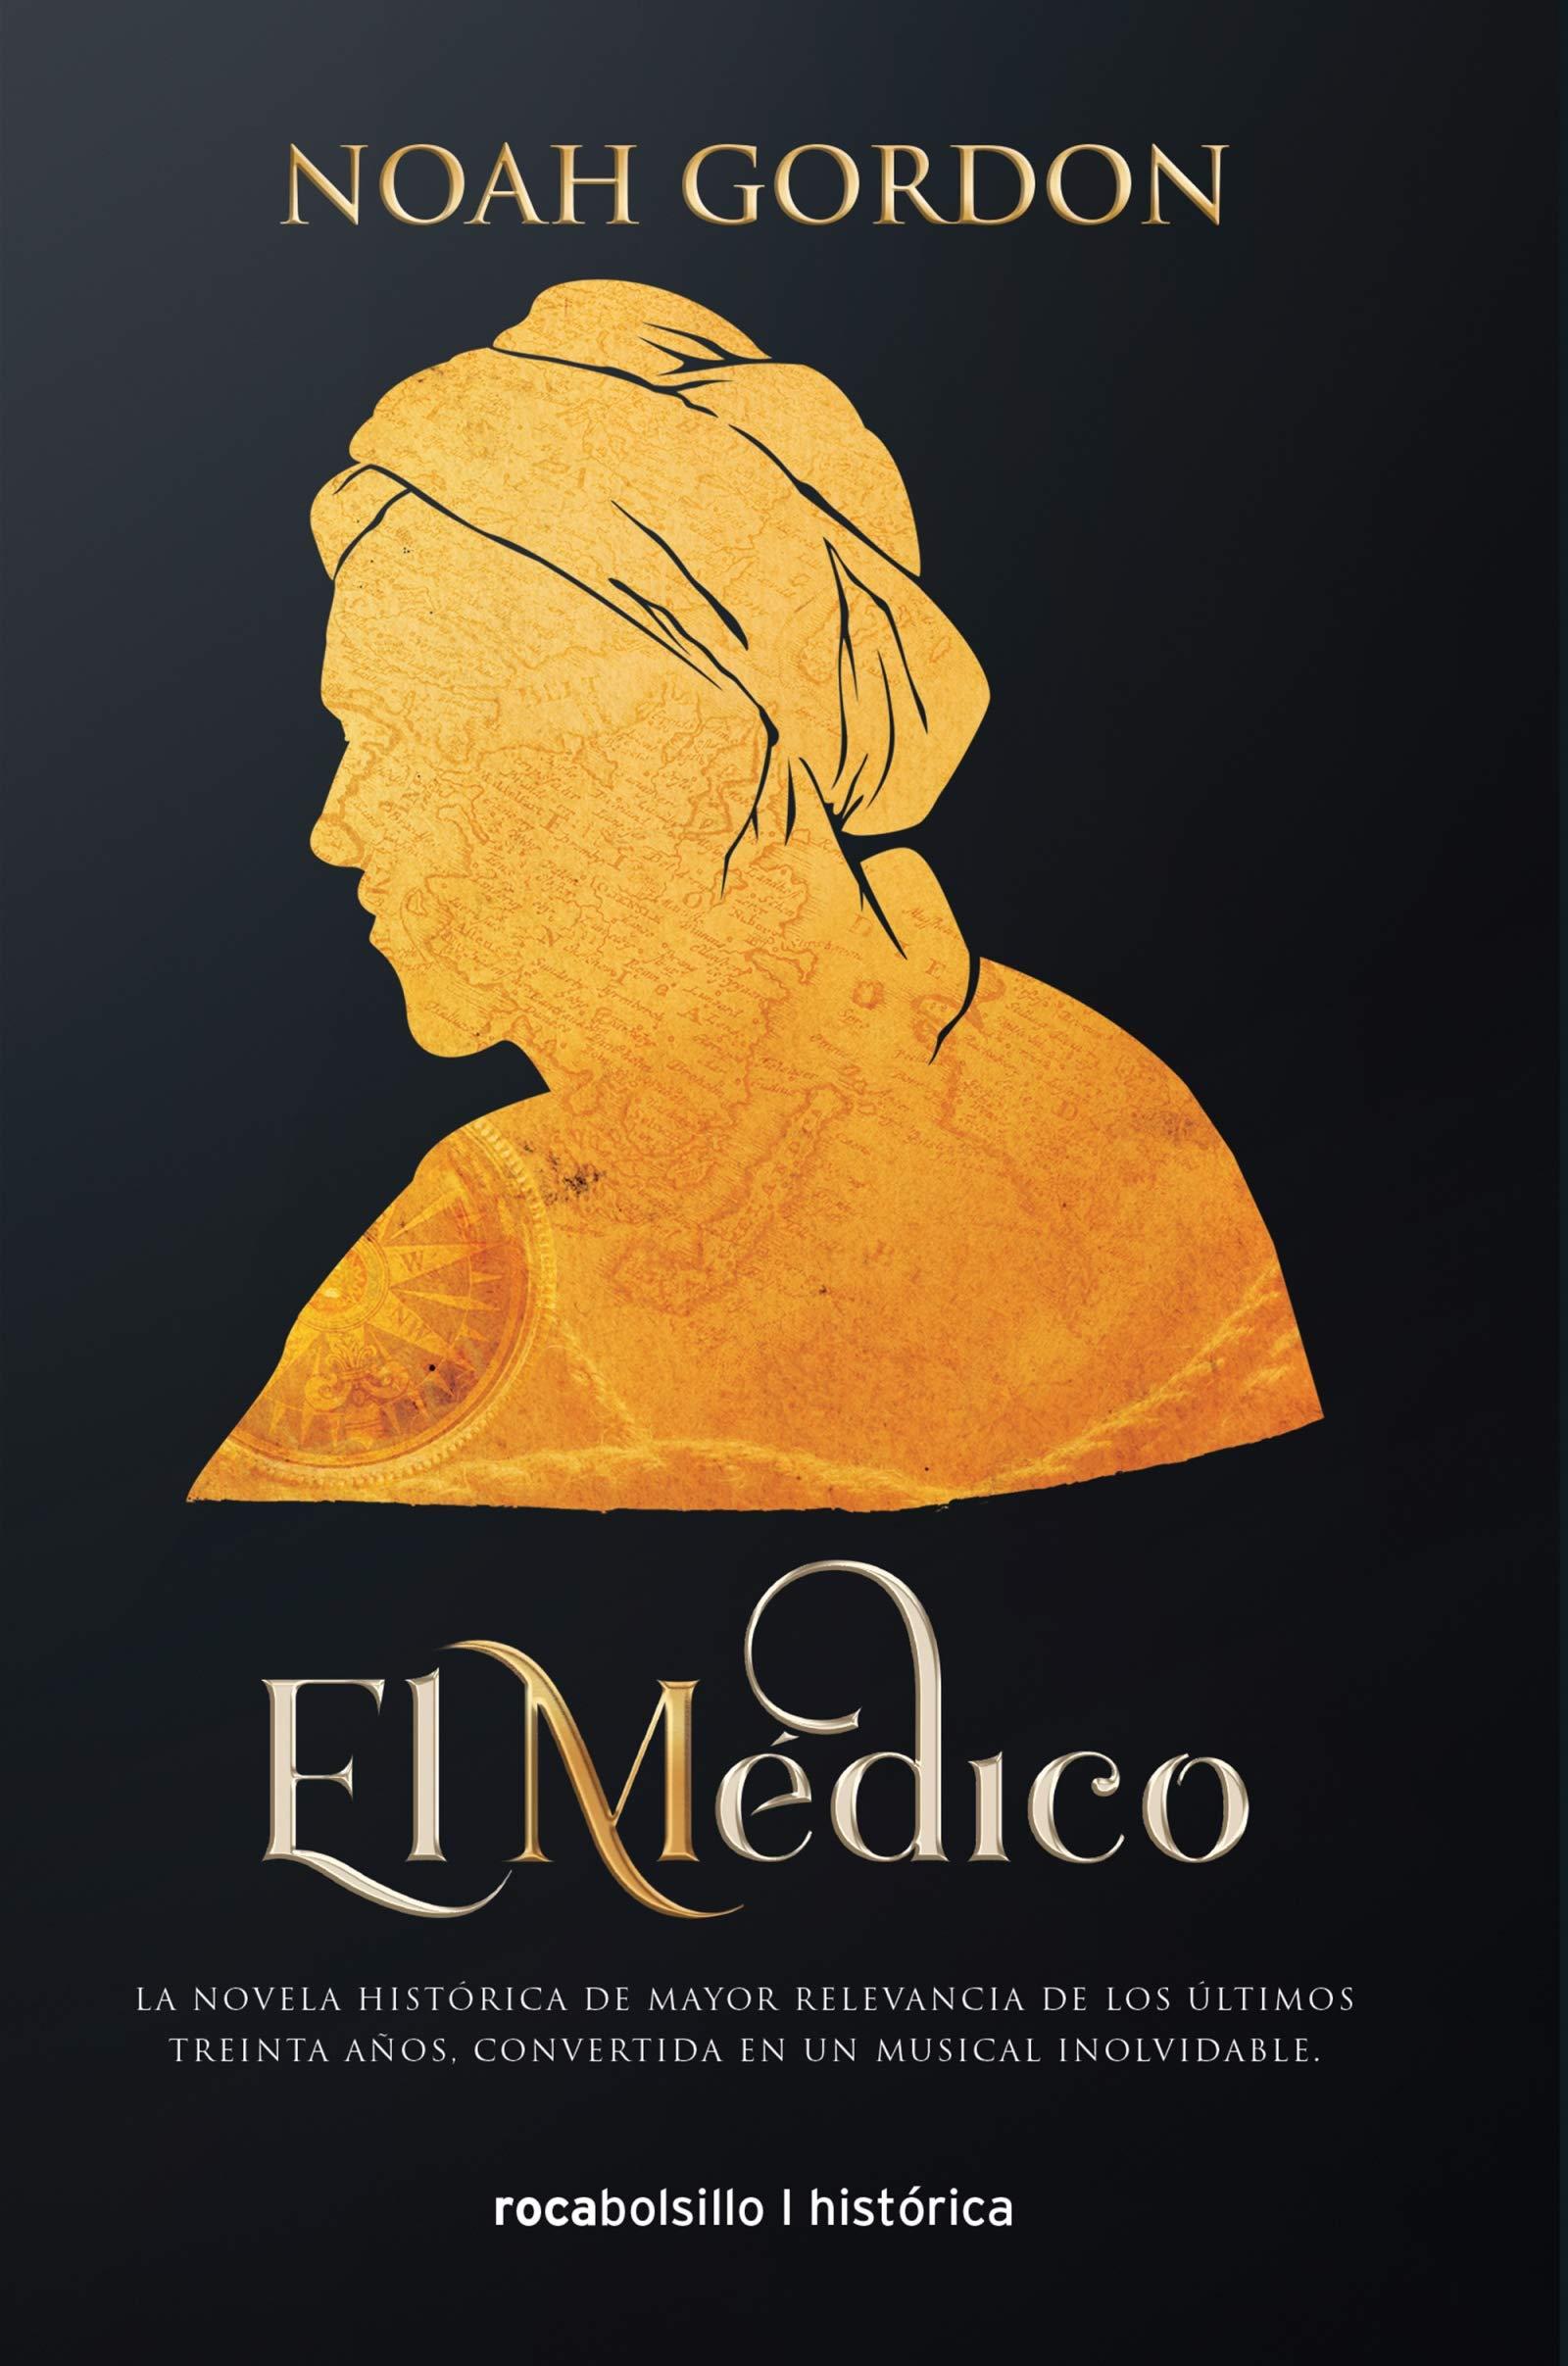 El médico (Best seller / Histórica): Amazon.es: Noah Gordon, Iris Menéndez:  Libros